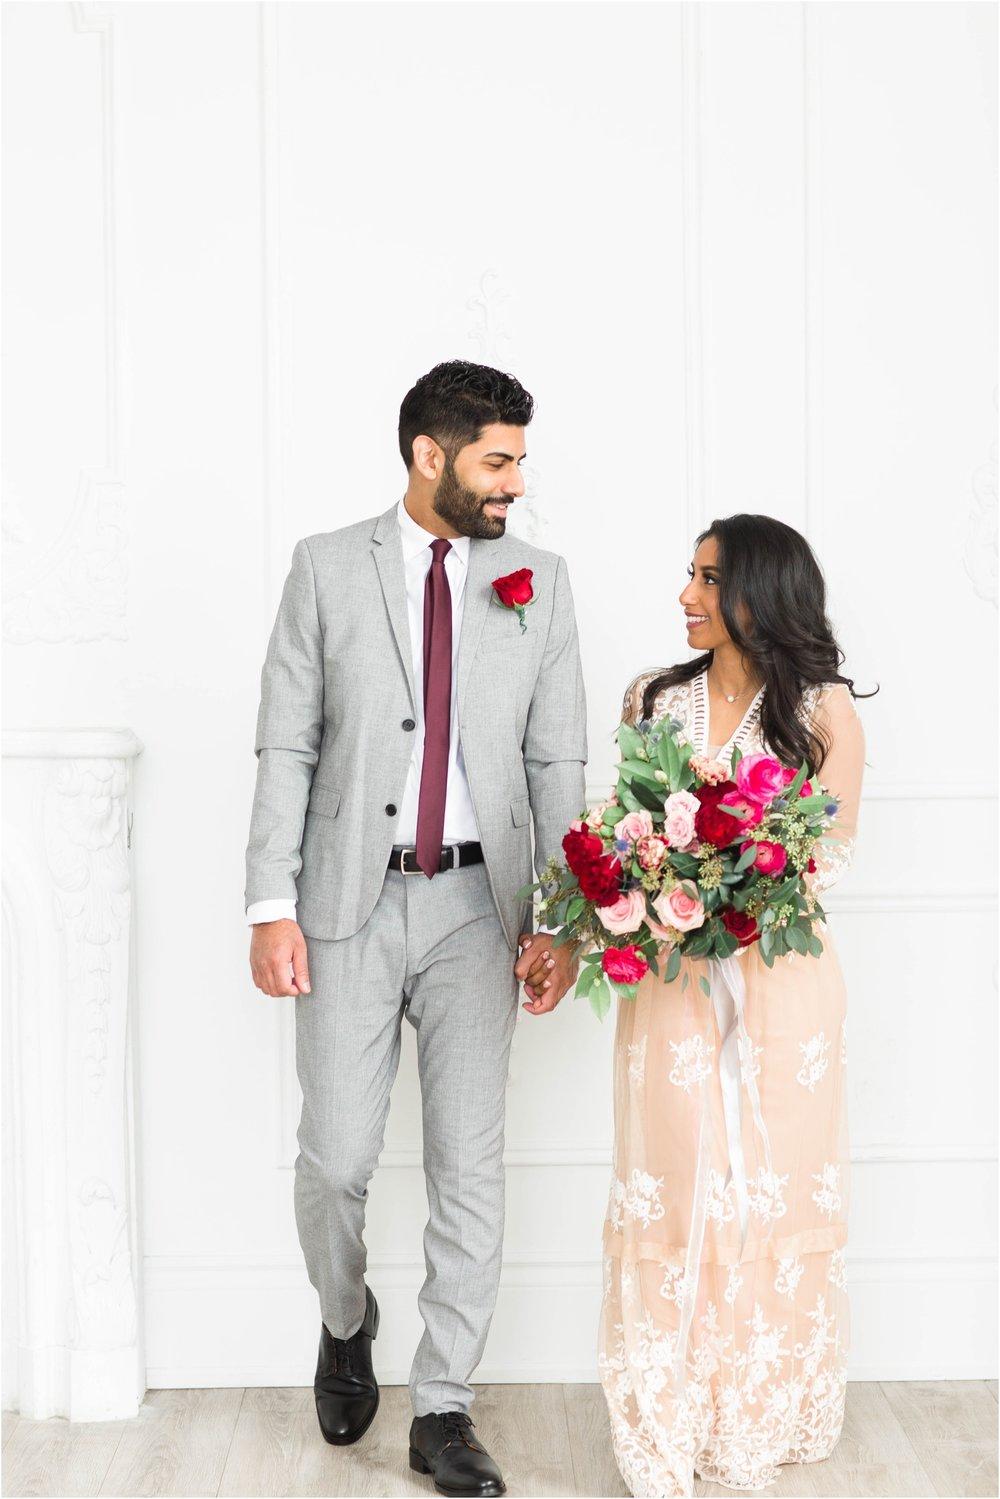 Mint-Room-Studios-Anniversary-Session-Toronto-Mississauga-Brampton-Scarborough-GTA-Pakistani-Indian-Wedding-Engagement-Photographer-Photography_0001.jpg